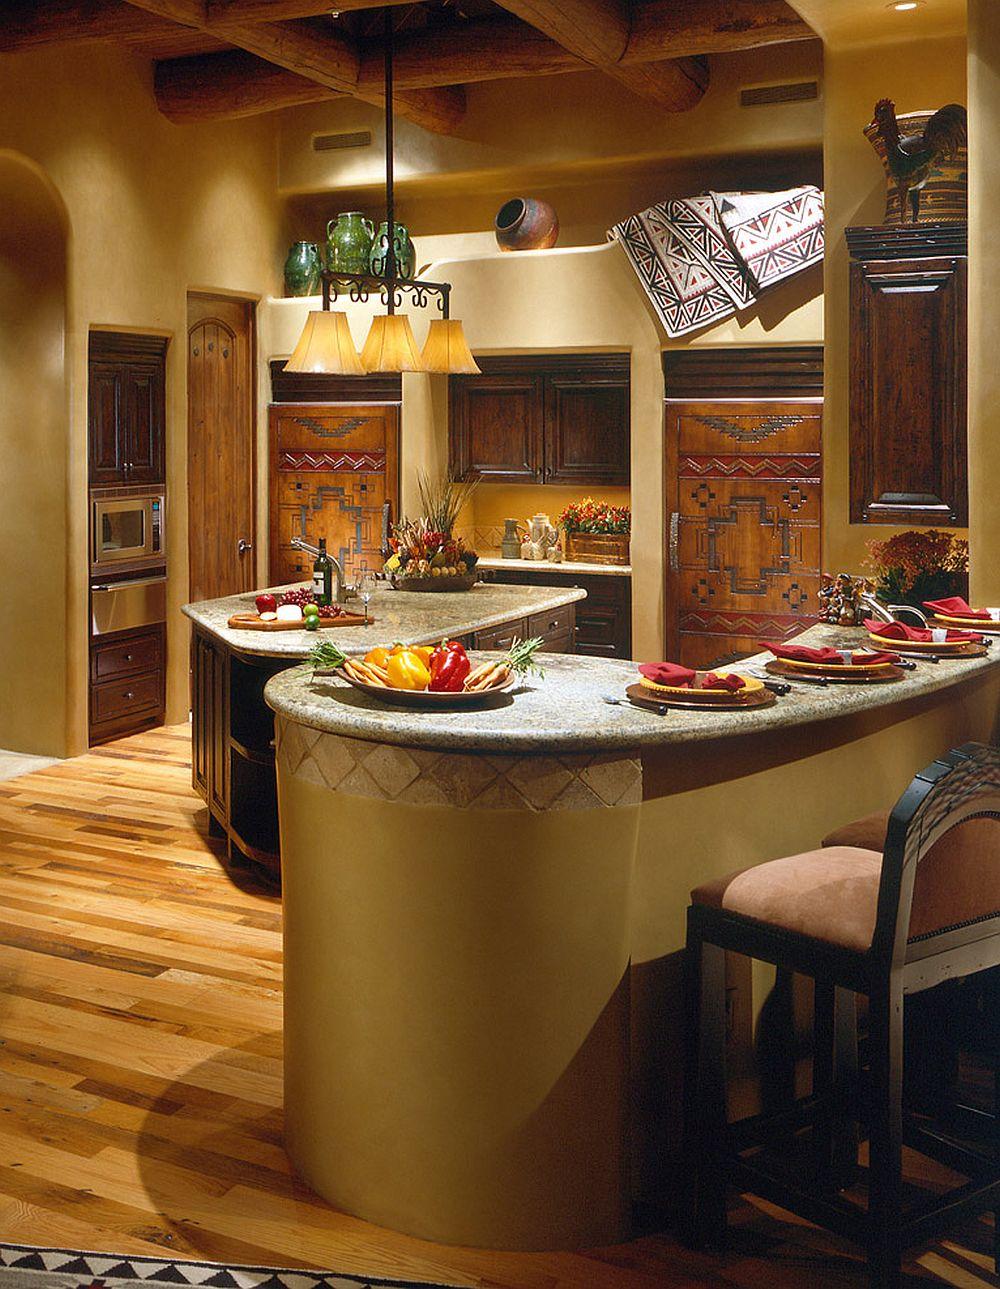 adelaparvu.com despre casa cu arhitectura organica in desert, casa rustica Pinnacle Canyon, arhitect Lee Hutchison  (9)